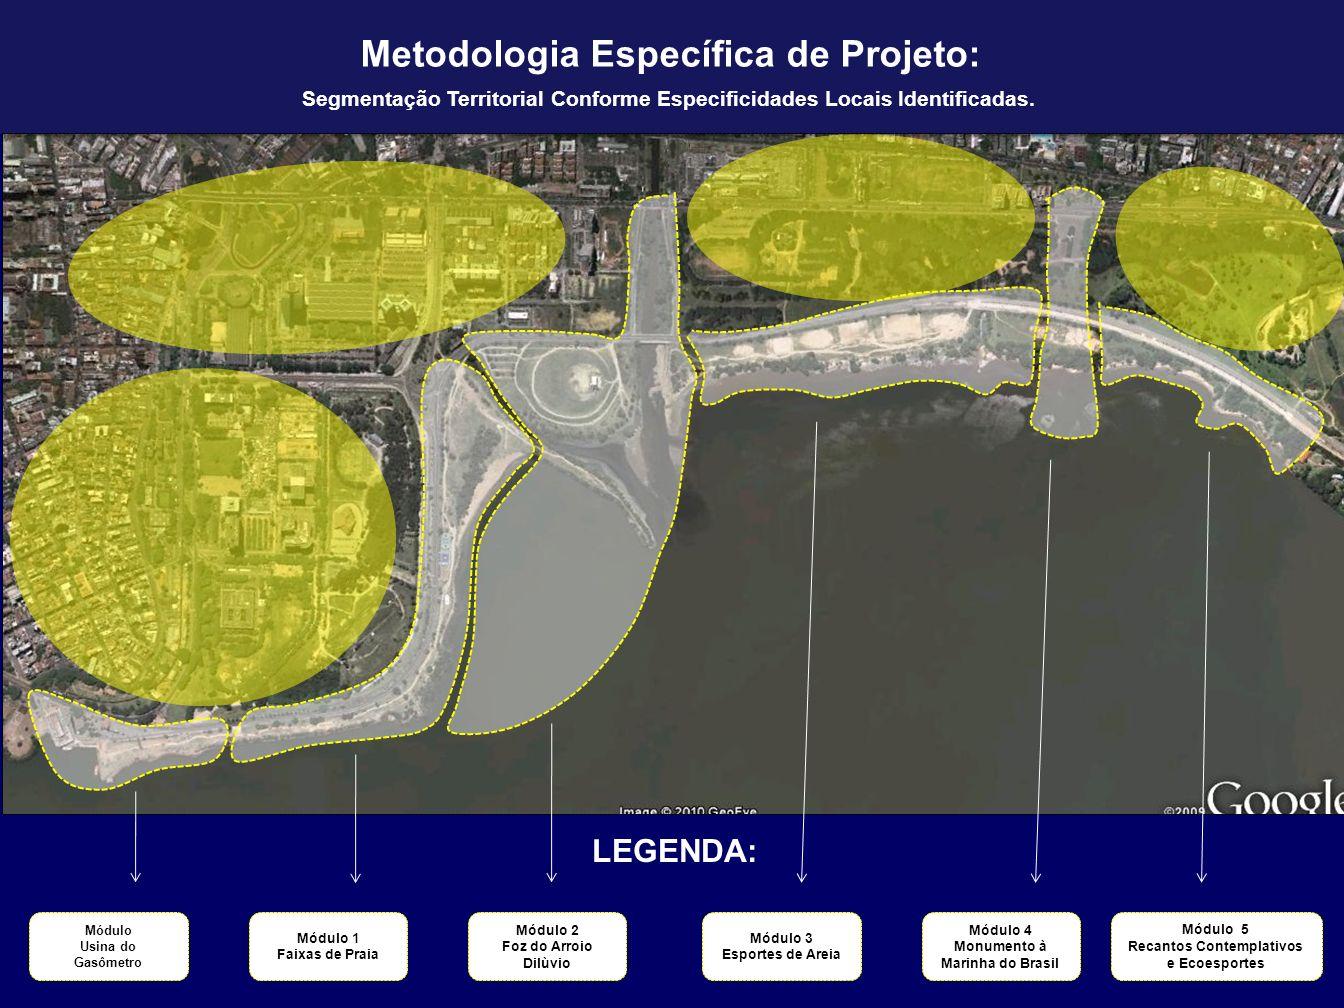 Metodologia Específica de Projeto: